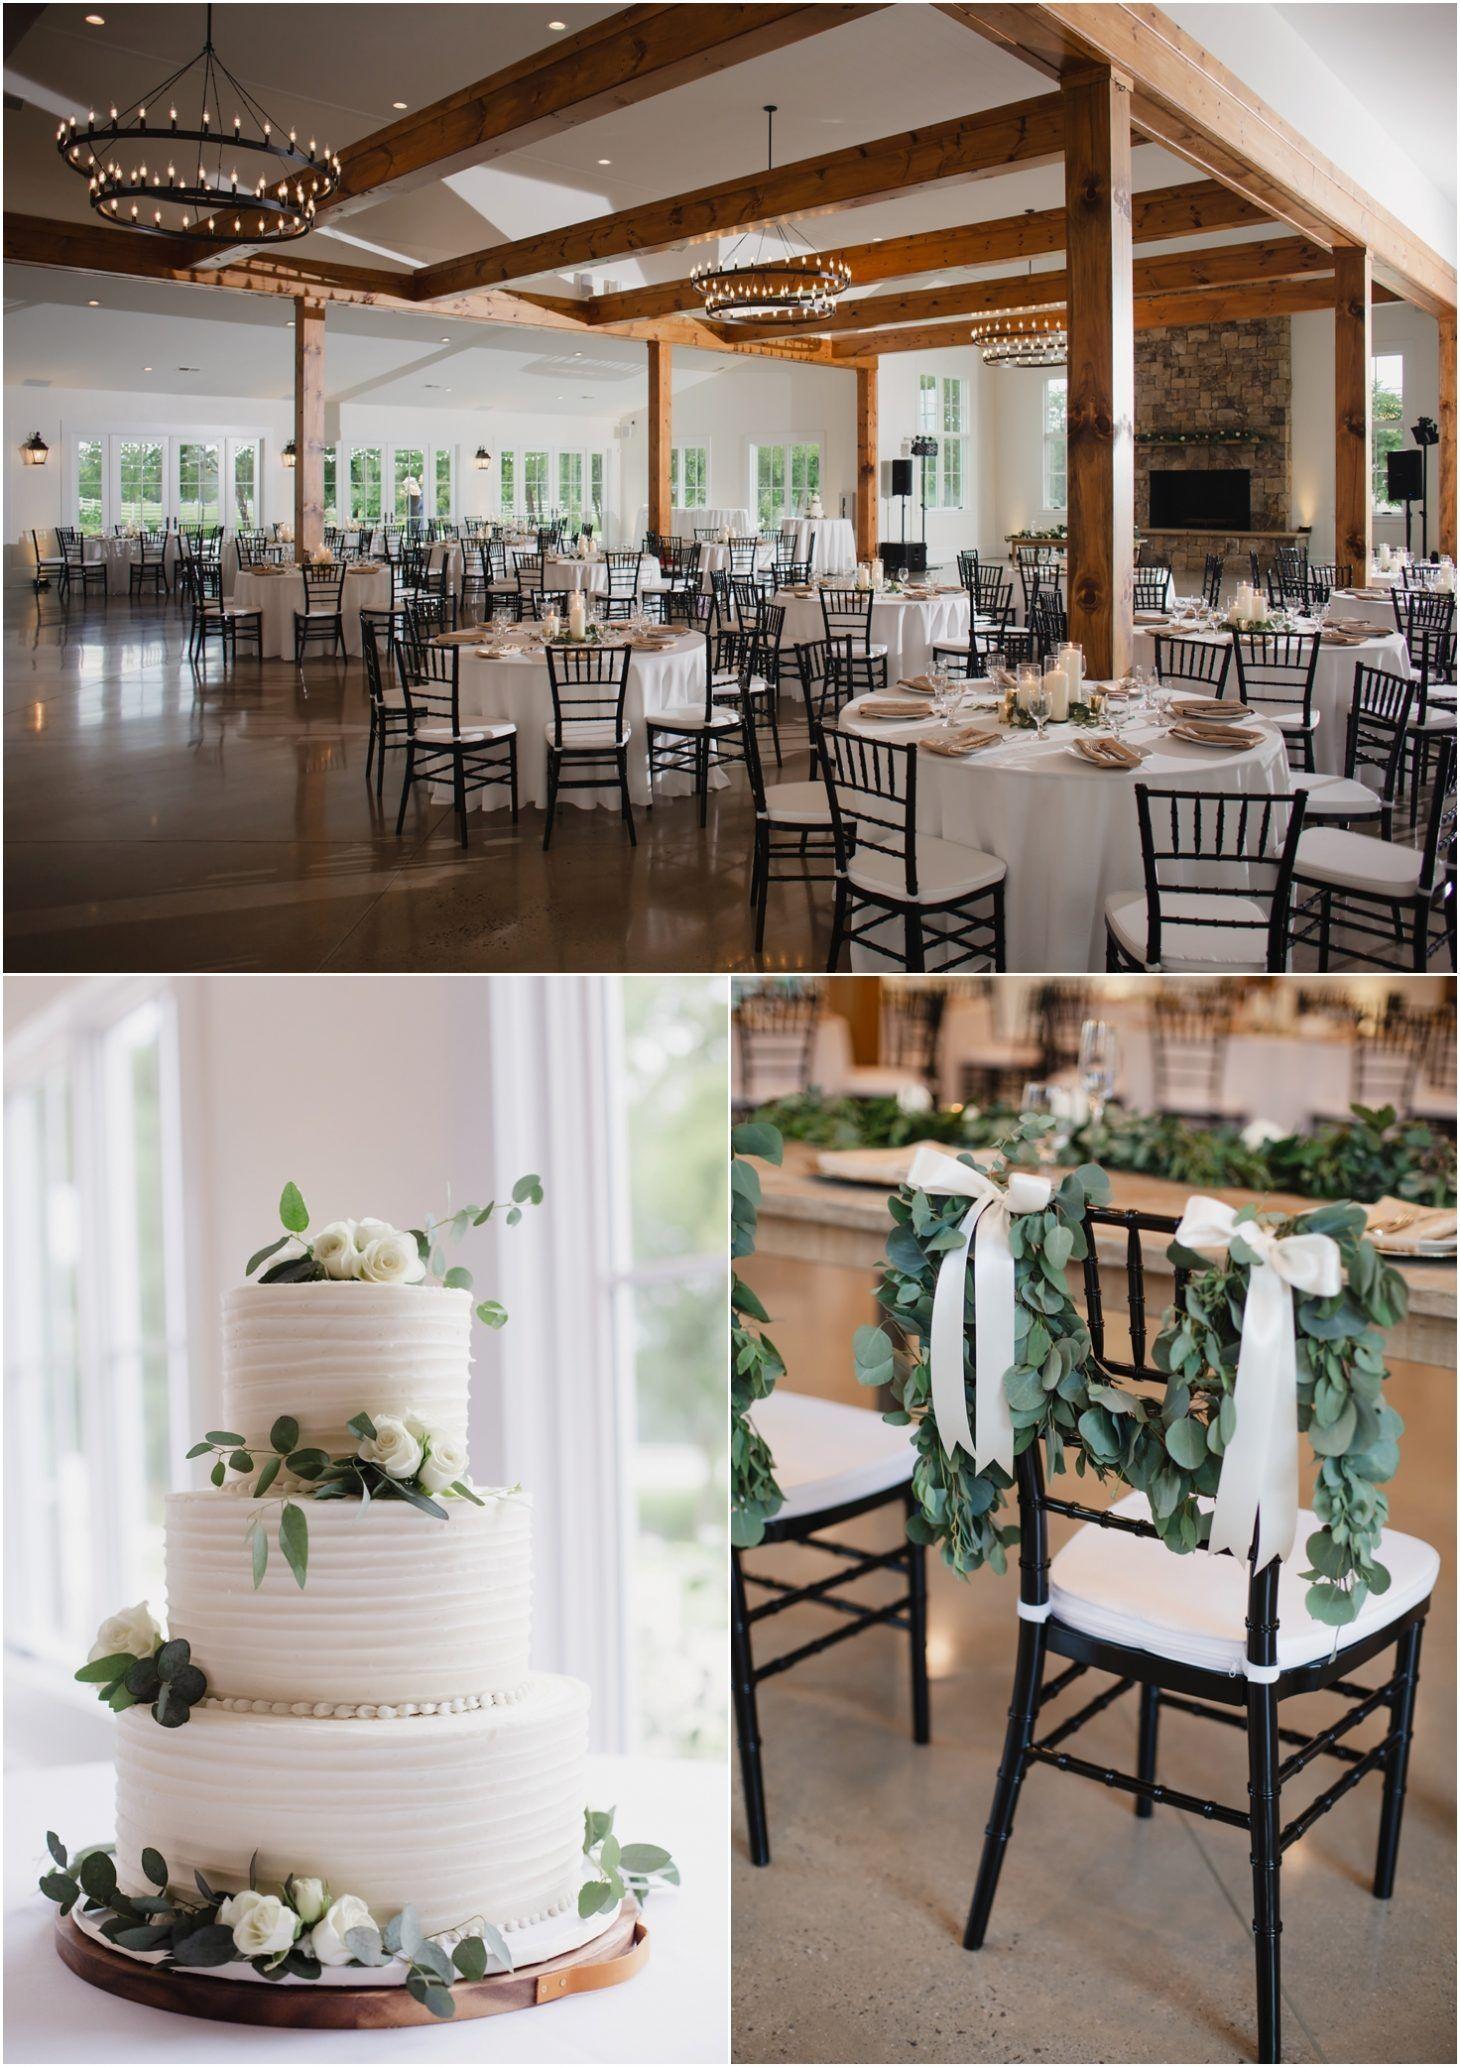 Wedding Reception Hall At Marblegate Farm In Friendsville Tn